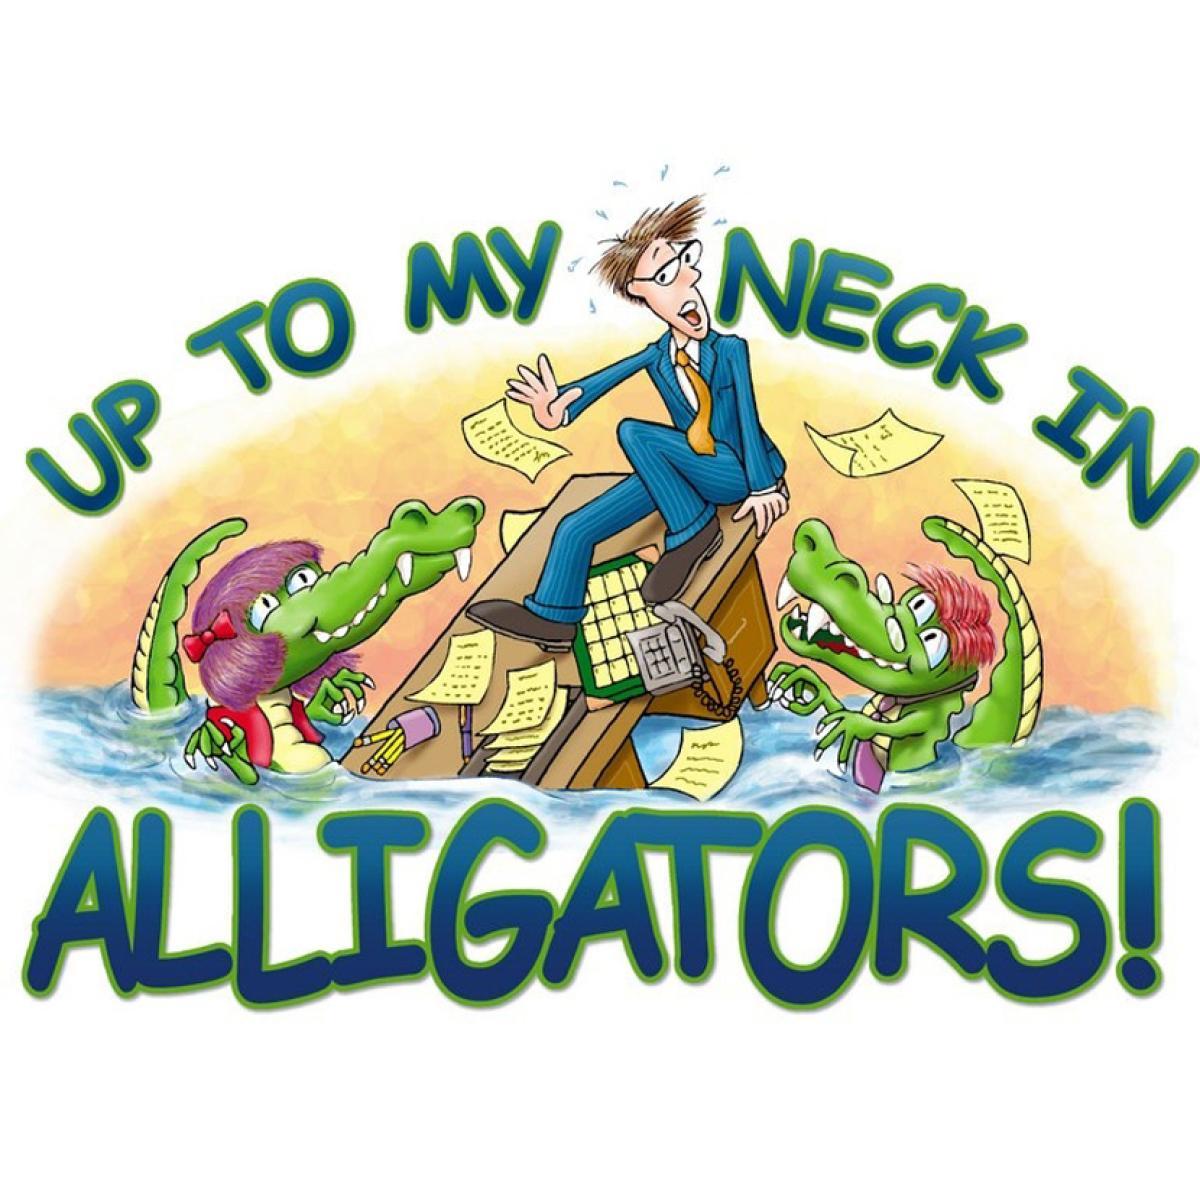 eb47d9a80 Kiva Lending Team: Up To My Neck In Alligators | Kiva